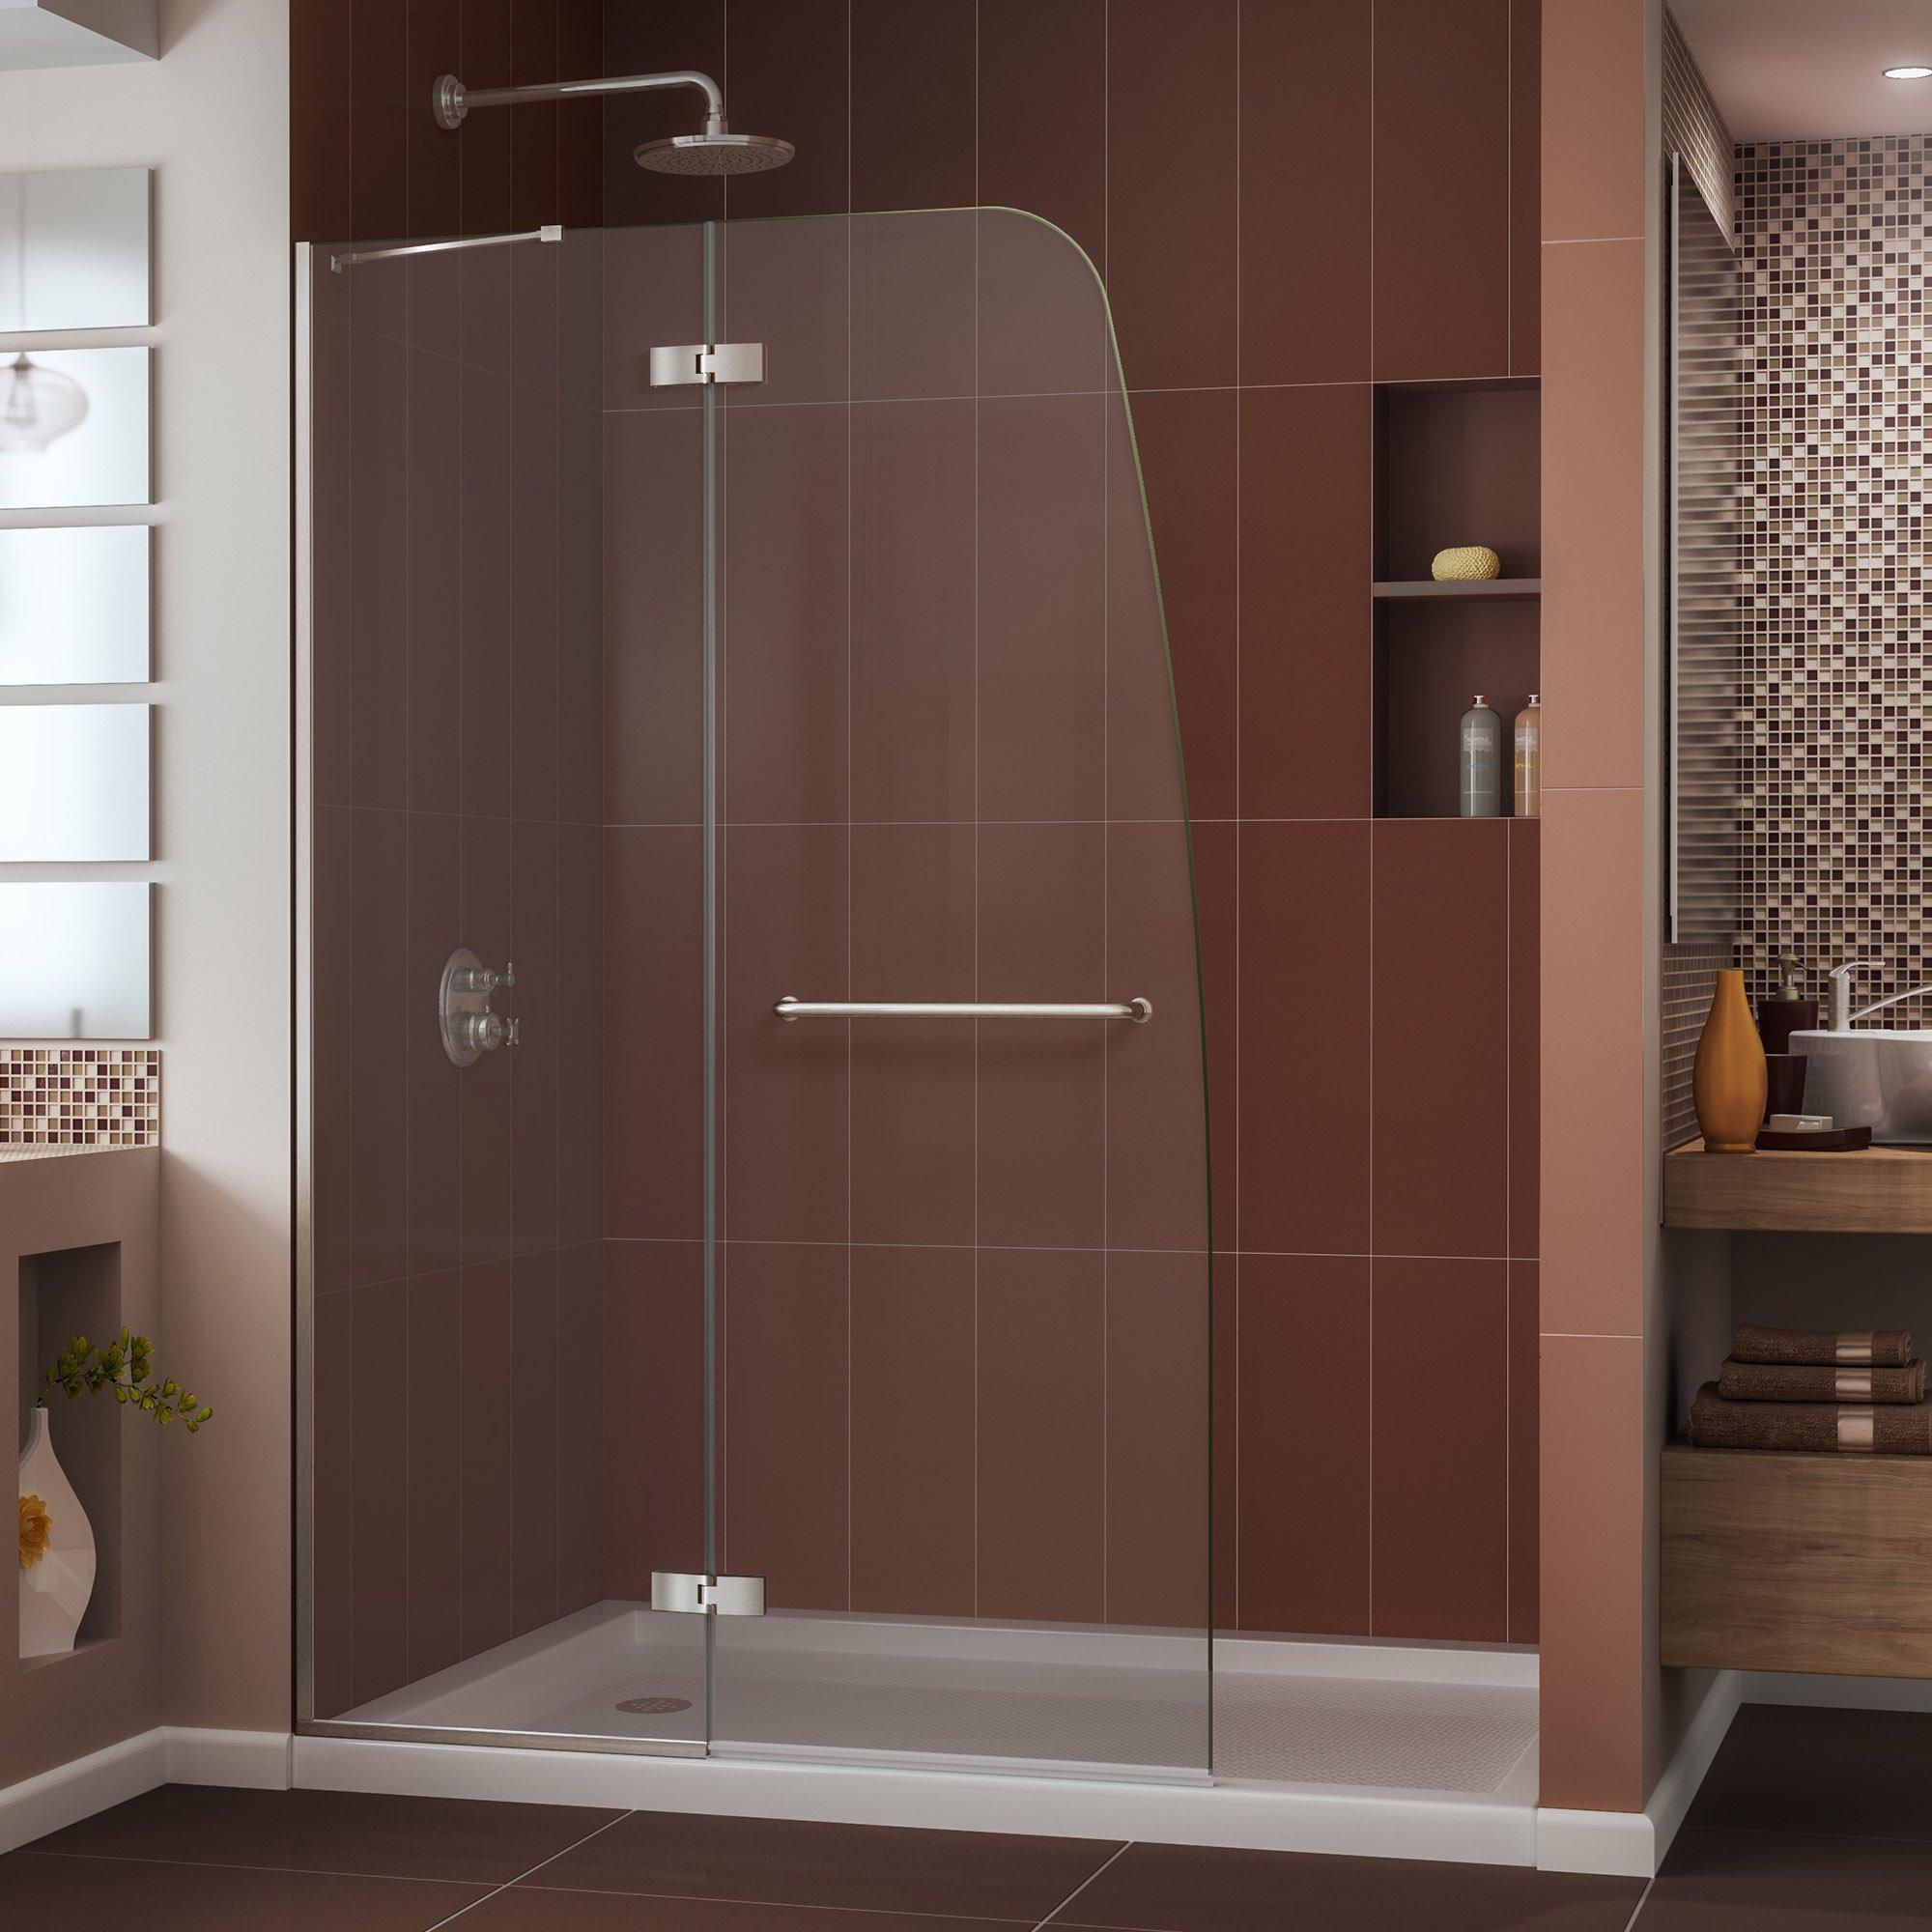 DreamLine Aqua Ultra 45 in. W x 72 in. H Frameless Hinged Shower Door in Brushed Nickel, SHDR-3445720-04 by DreamLine (Image #1)